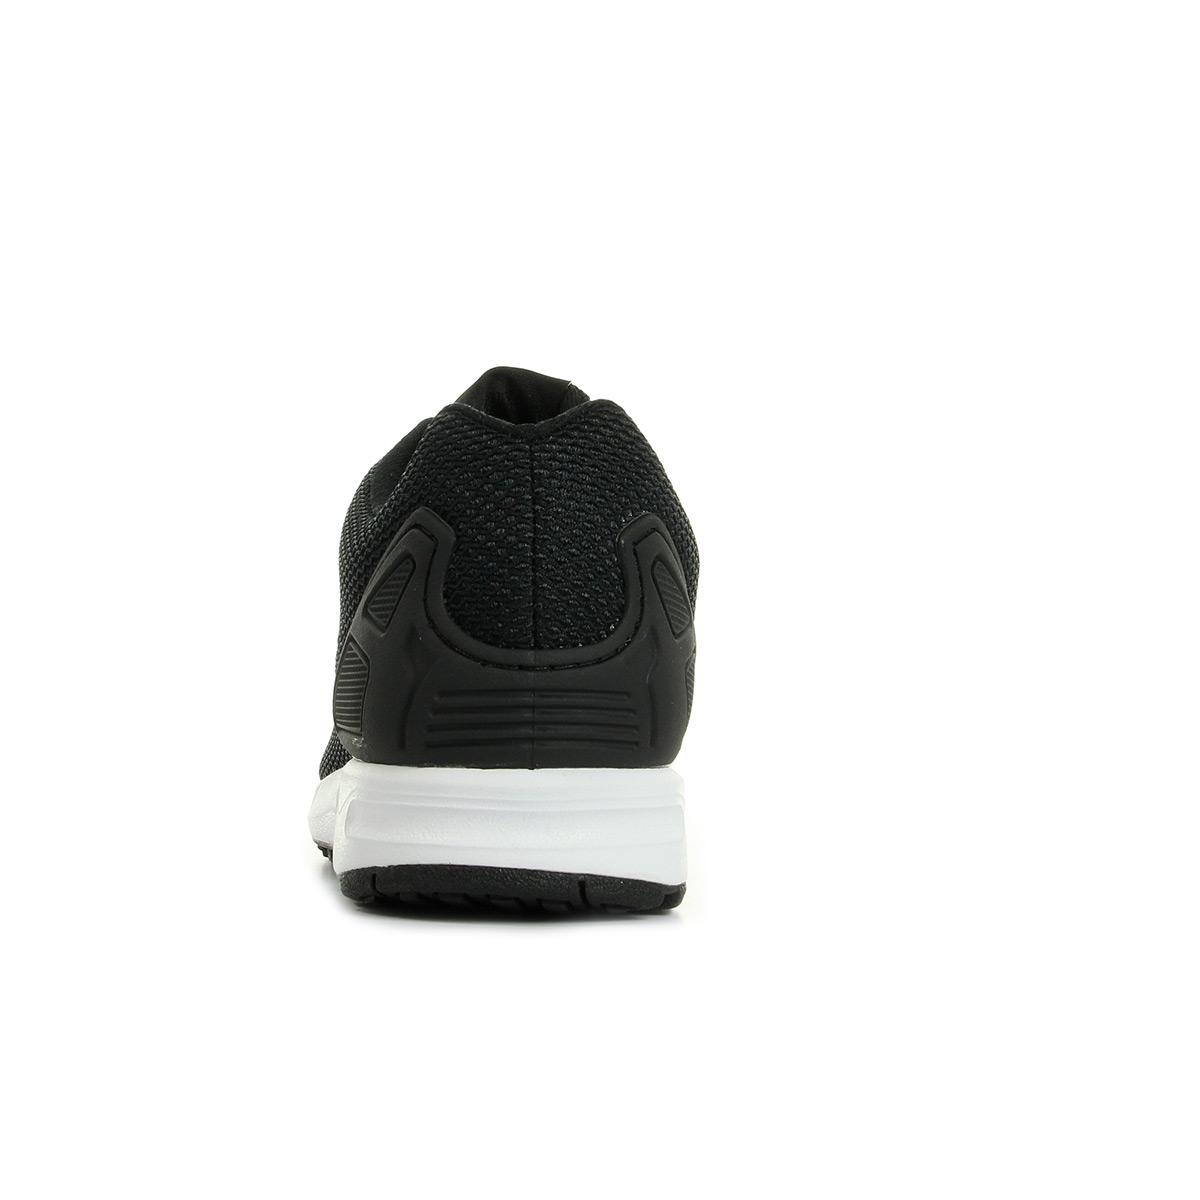 adidas Zx Flux S32274, Baskets mode homme